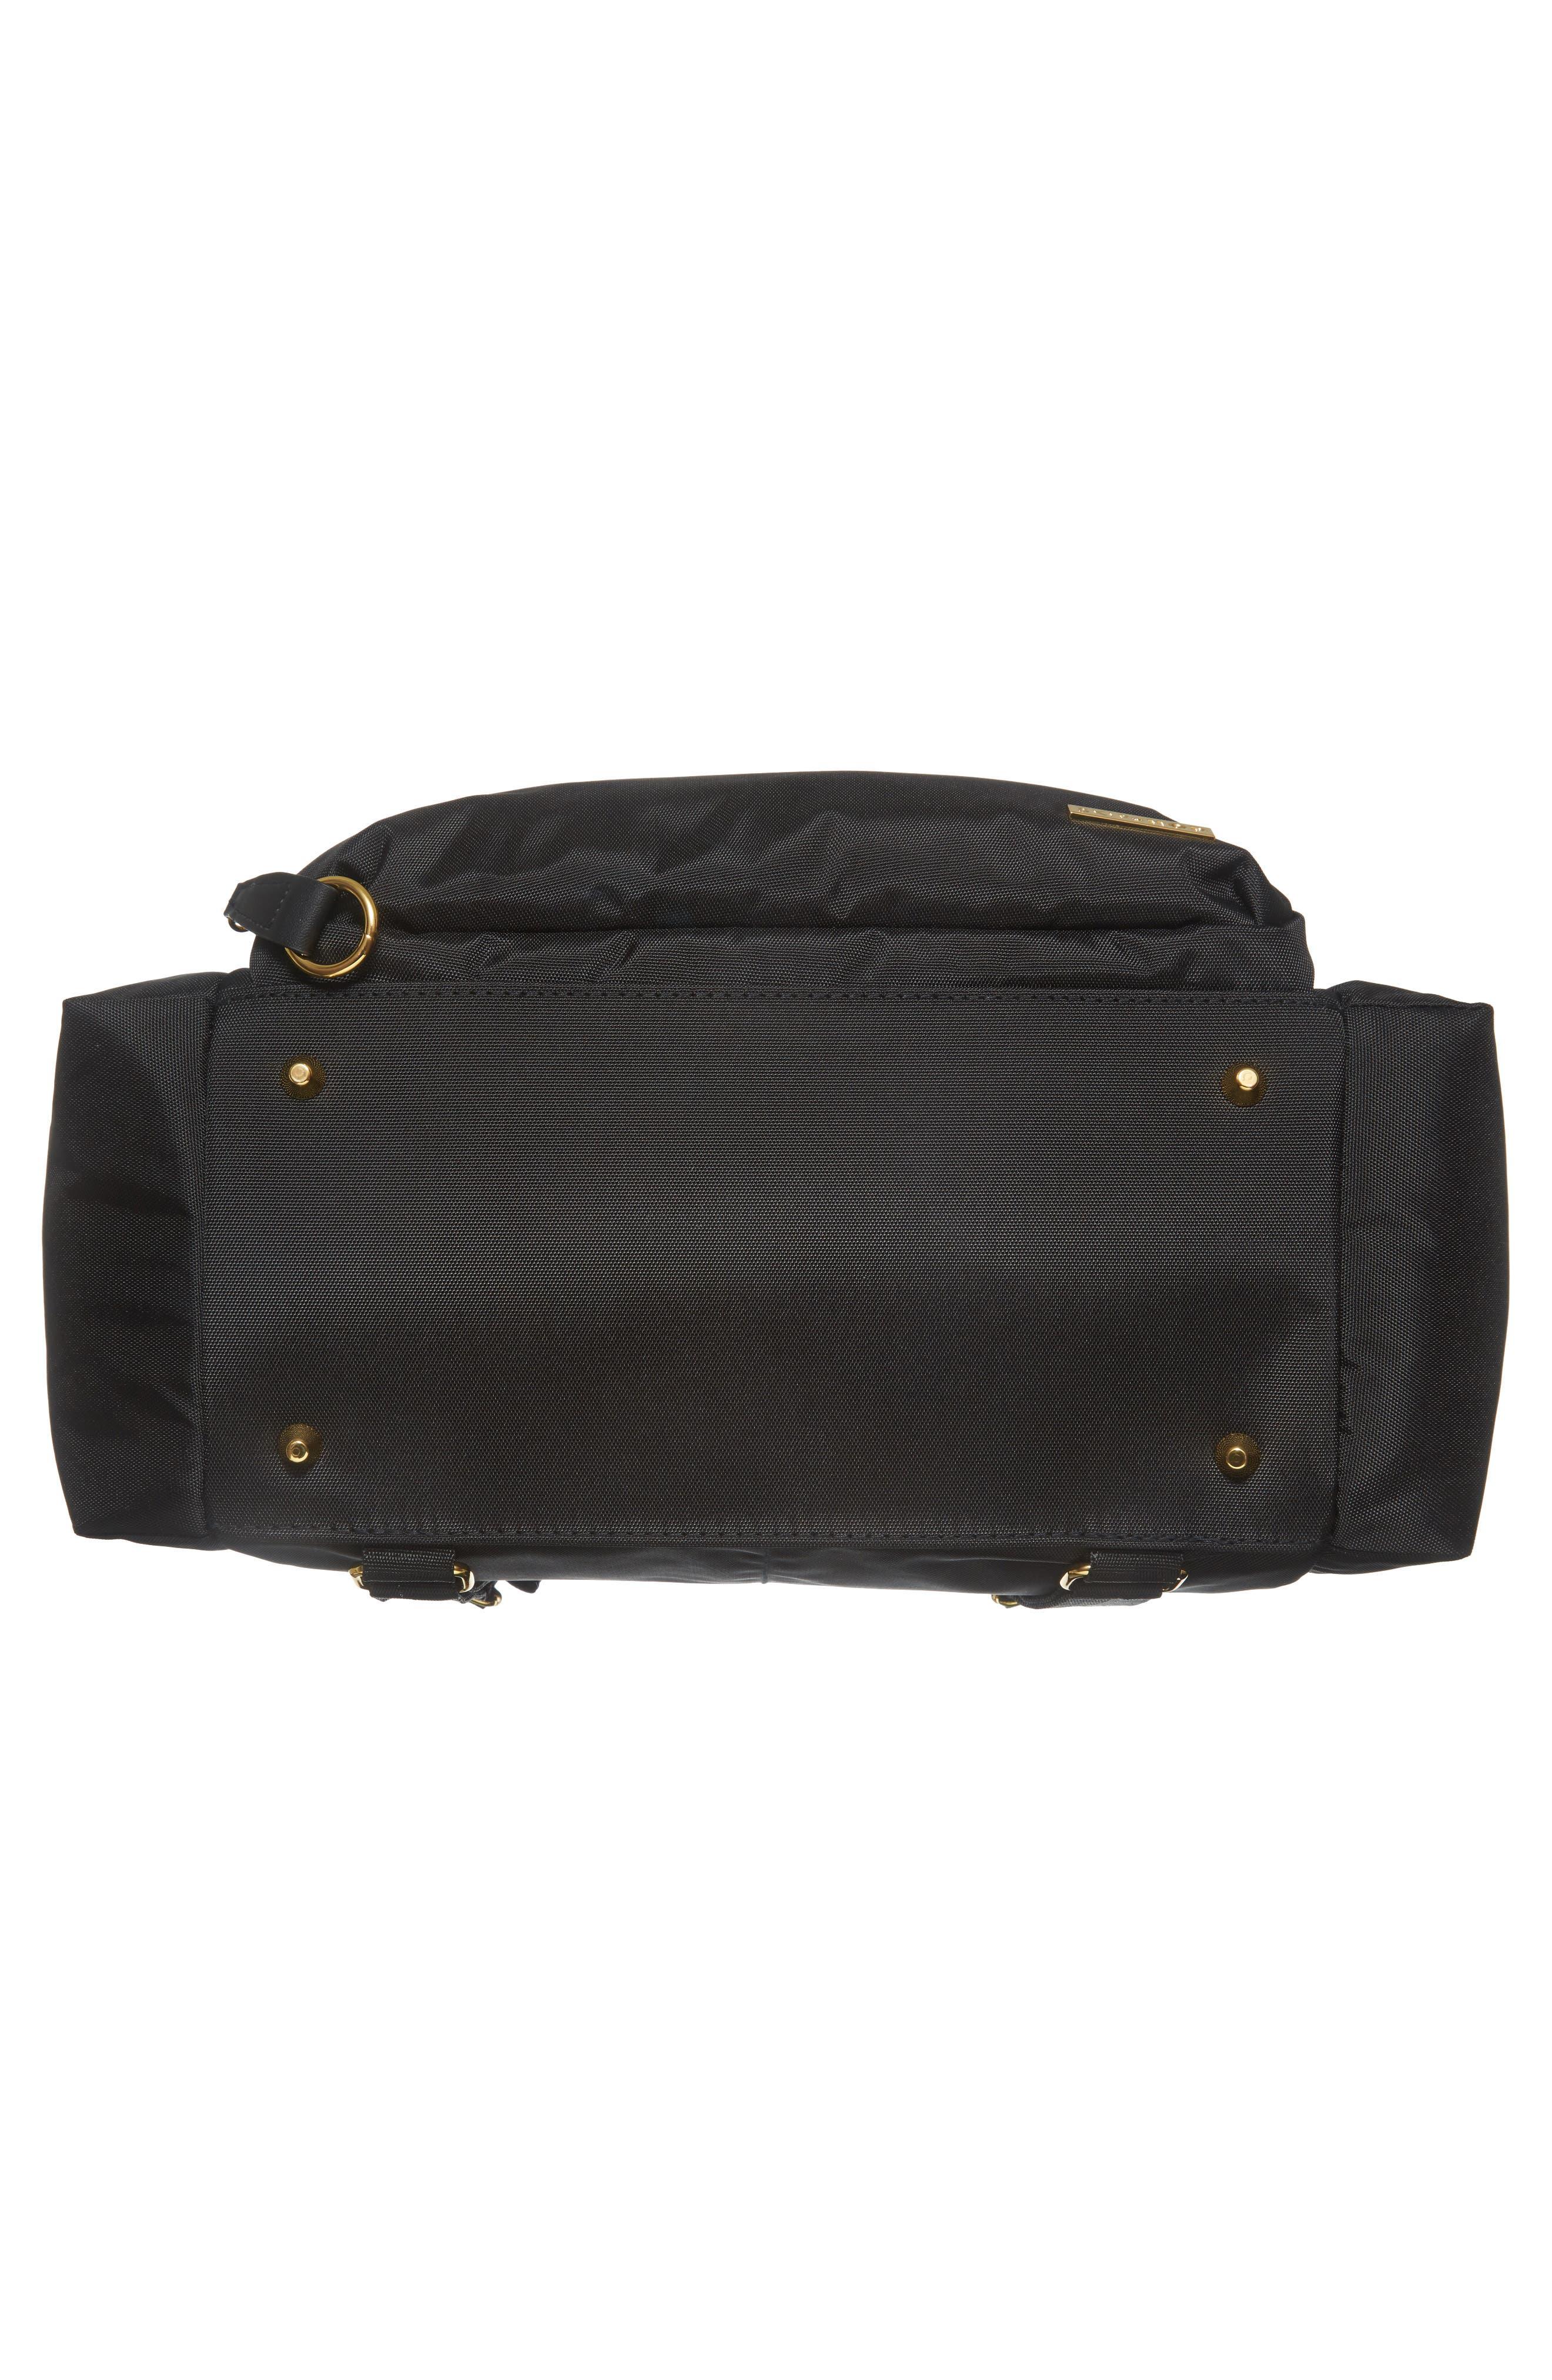 'Chelsea' Diaper Bag Backpack,                             Alternate thumbnail 6, color,                             BLACK